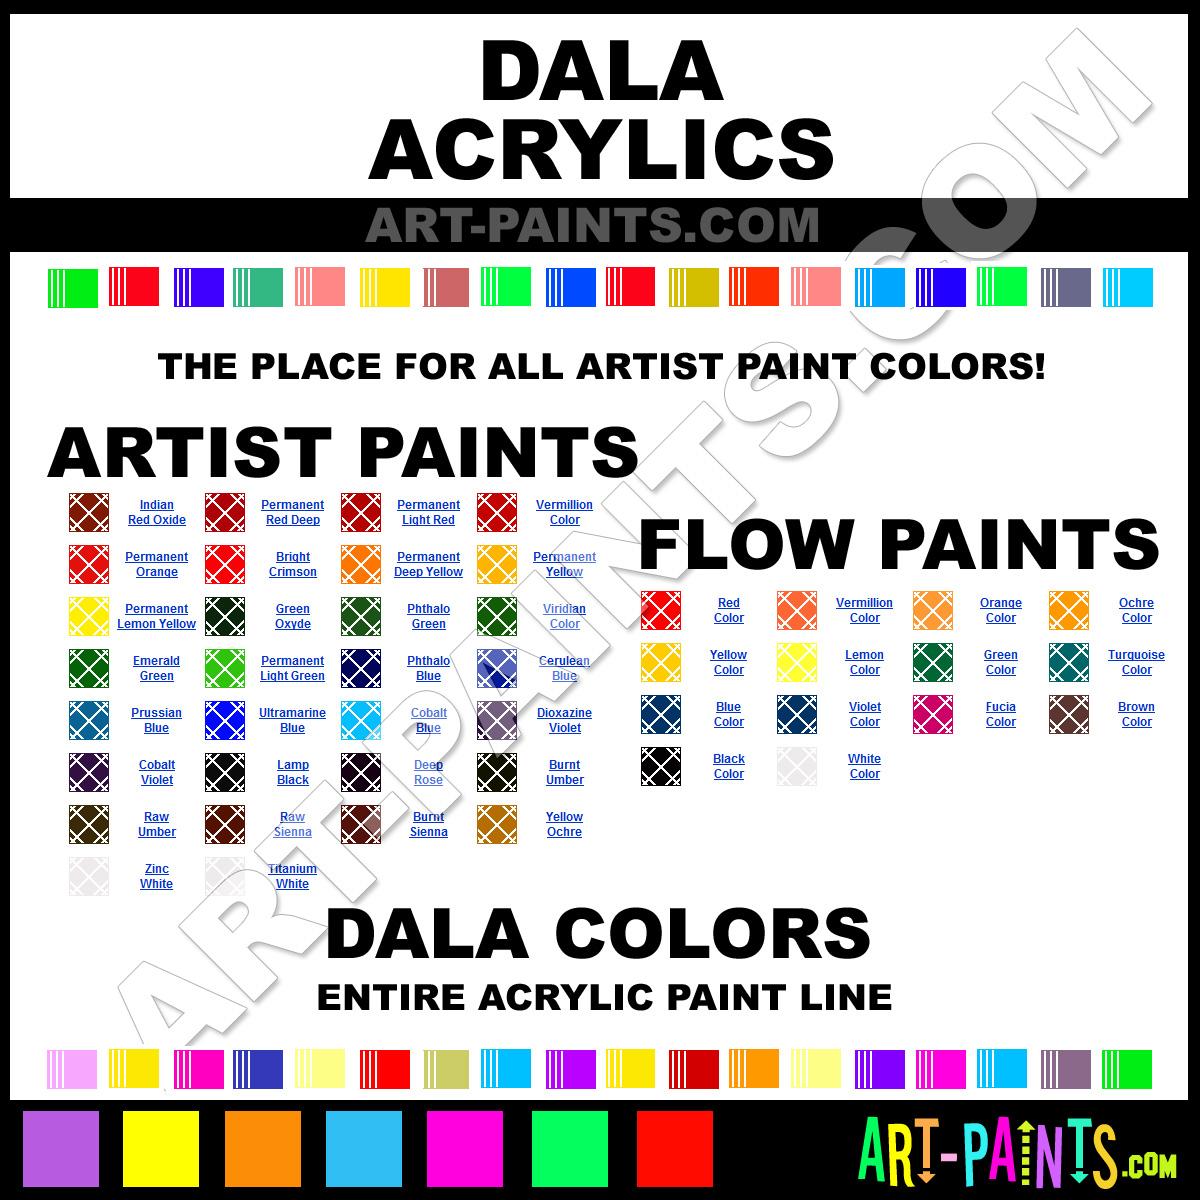 Dala Acrylic Paint Brands Dala Paint Brands Acrylic Paint Artist Acrylic Paints Flow